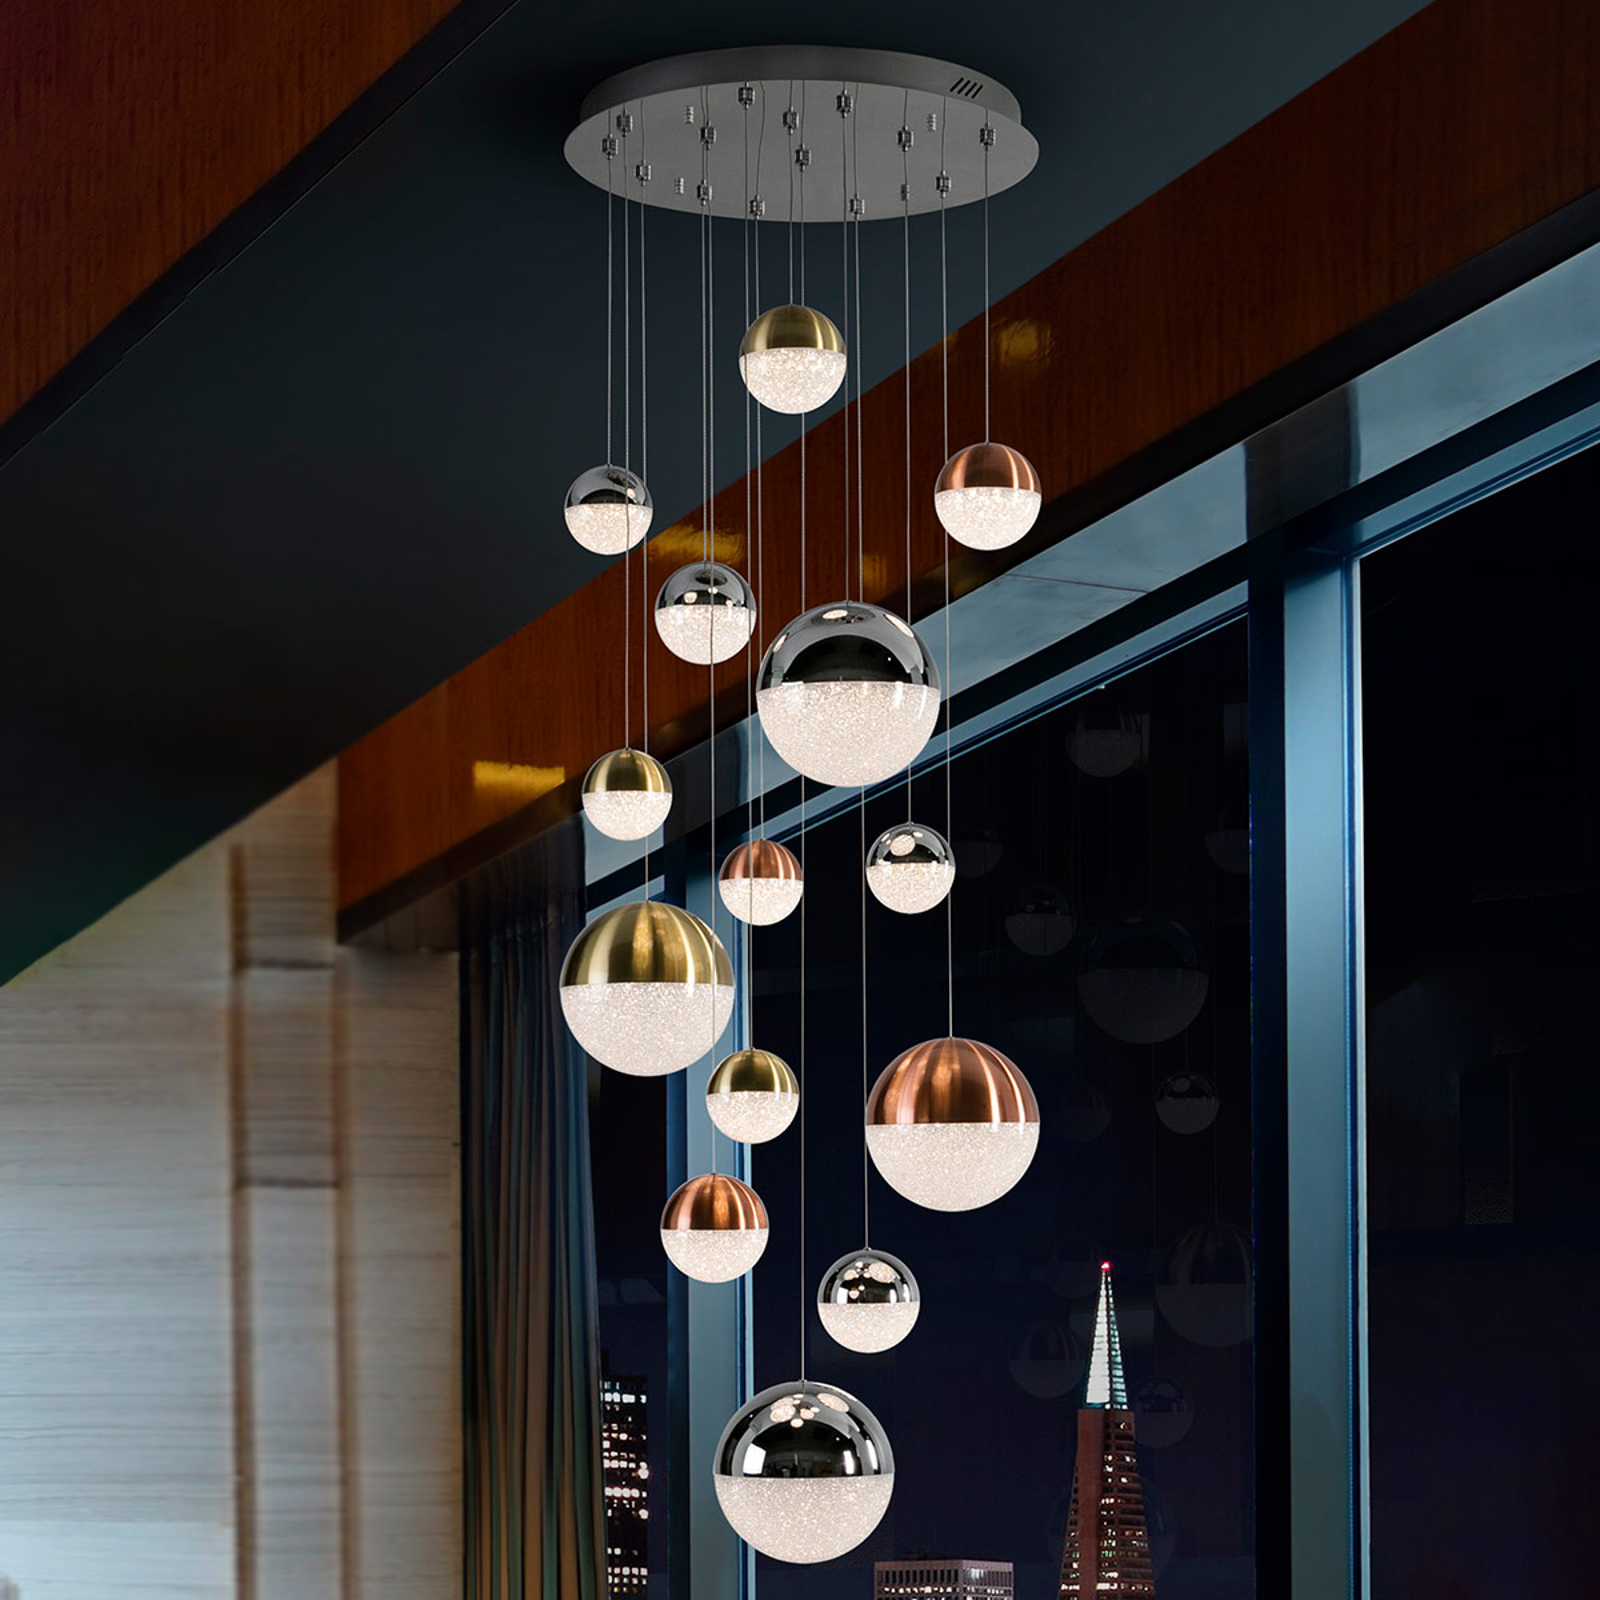 Lampa wisząca LED Sphere, multicolor, 14-punktowa